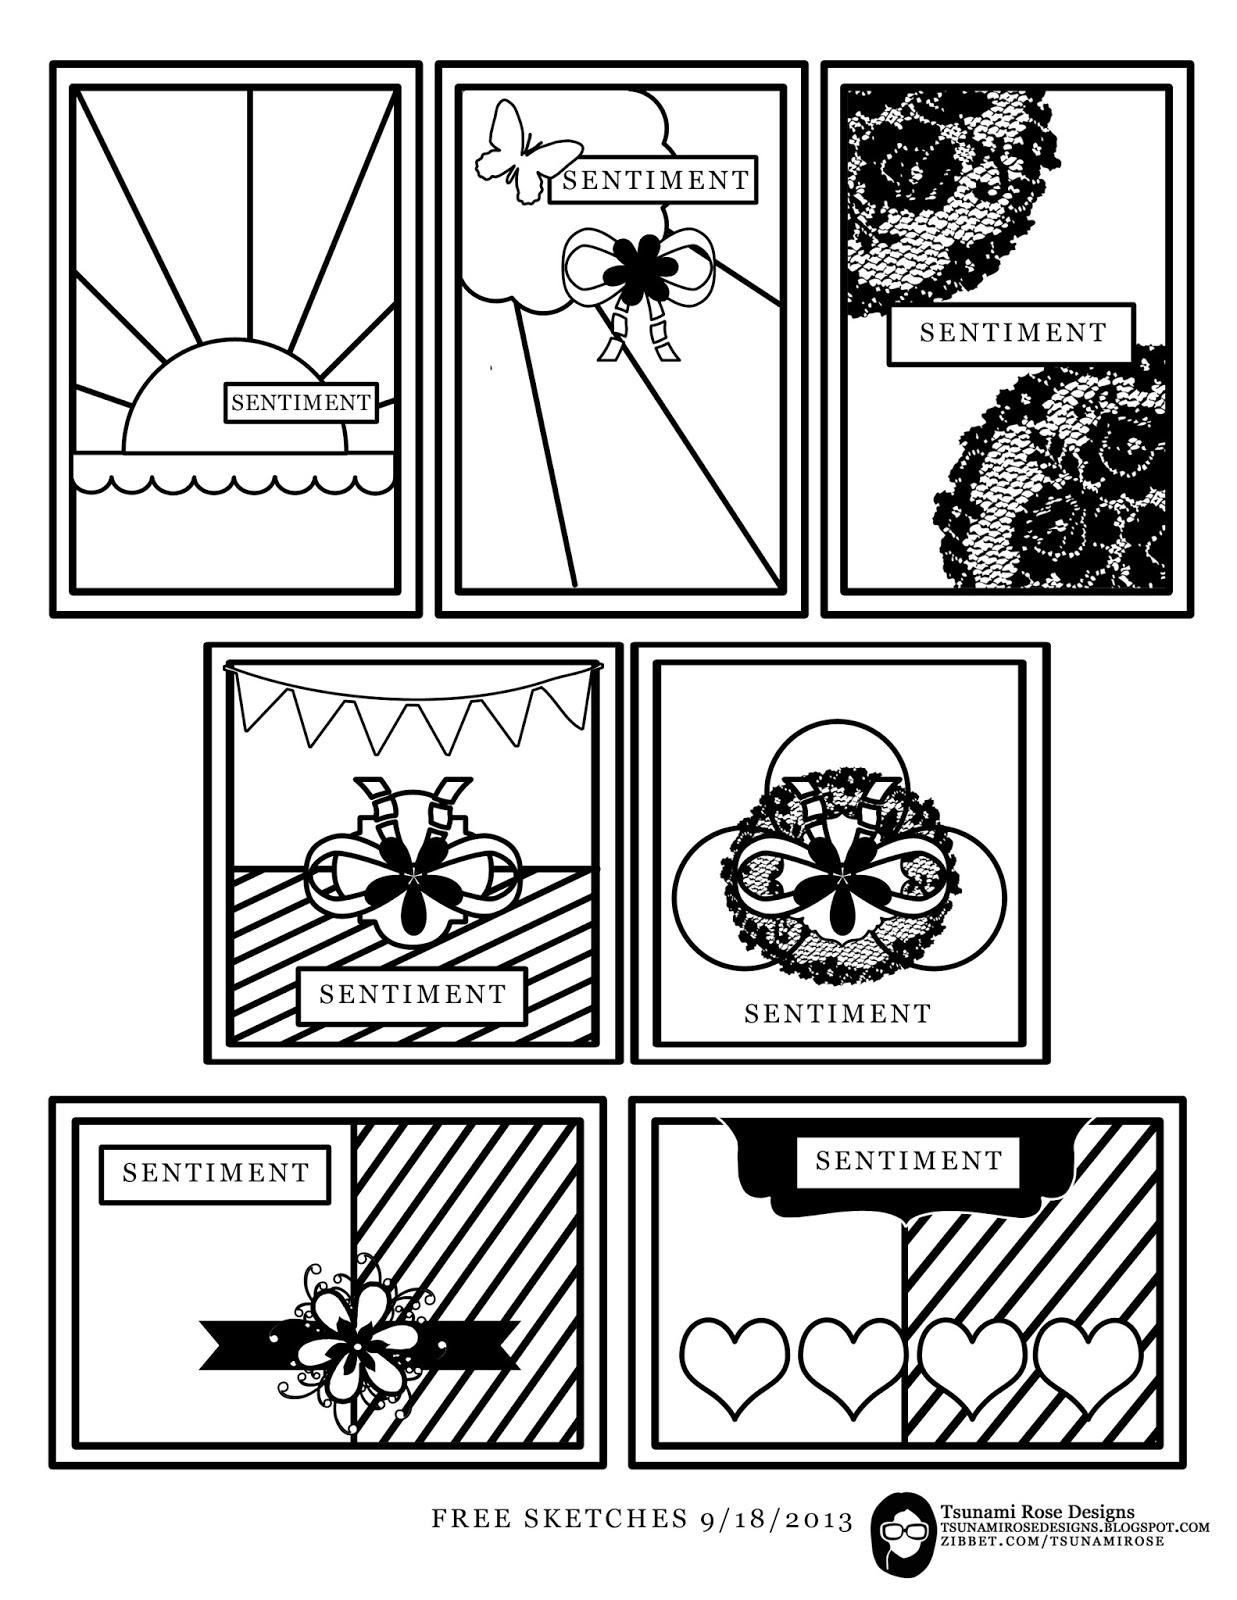 Tsunami Rose Designs: New Free Printable Sketches, Enjoy!